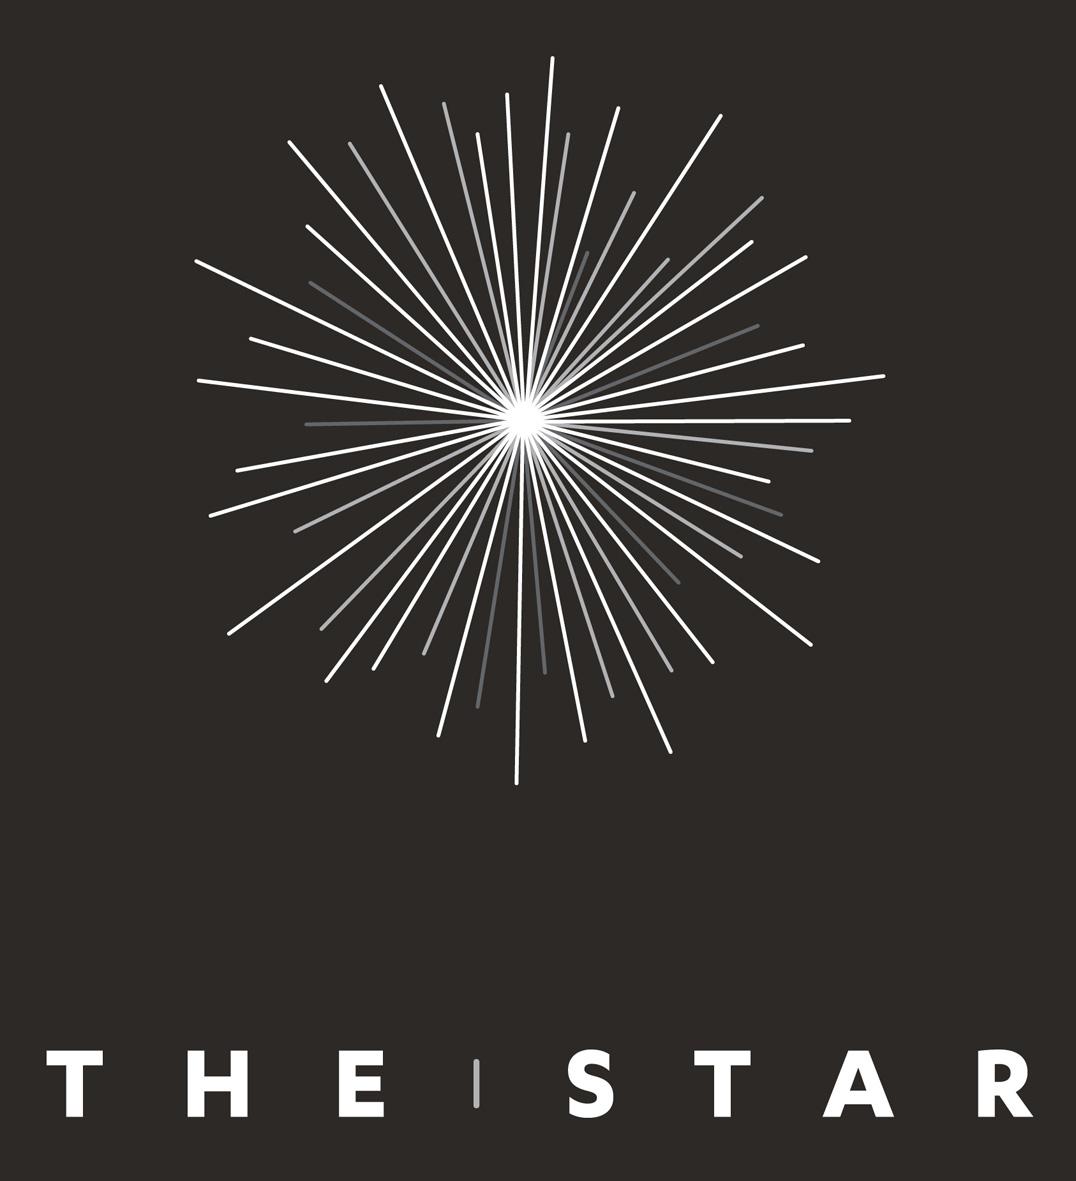 The_star_logo_black.jpeg